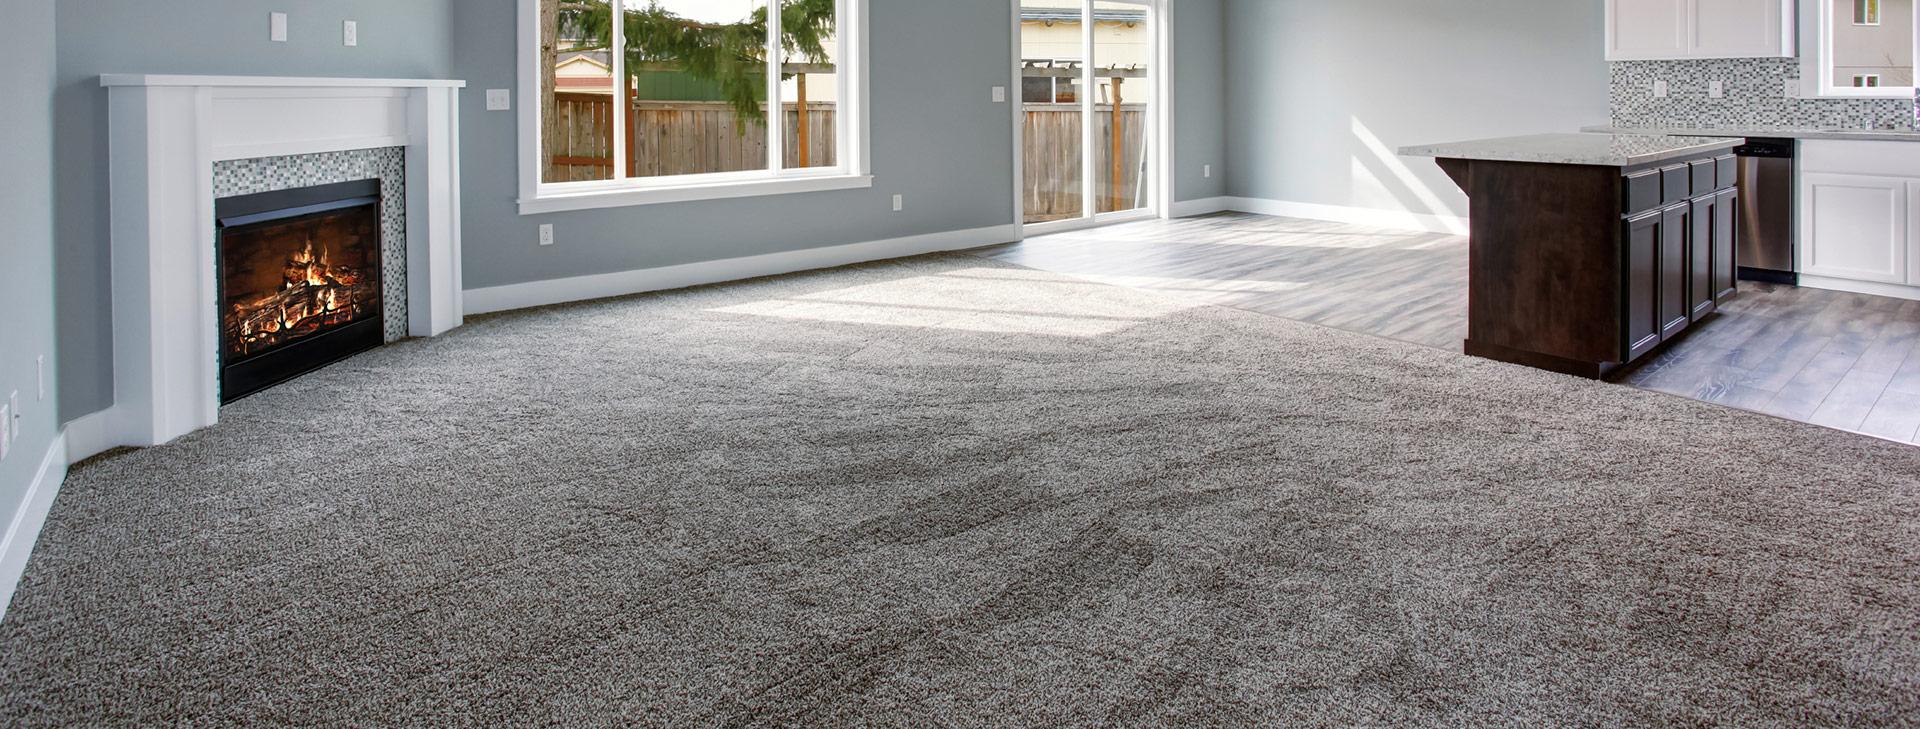 best carpet carpet cleaning FWDBHSW